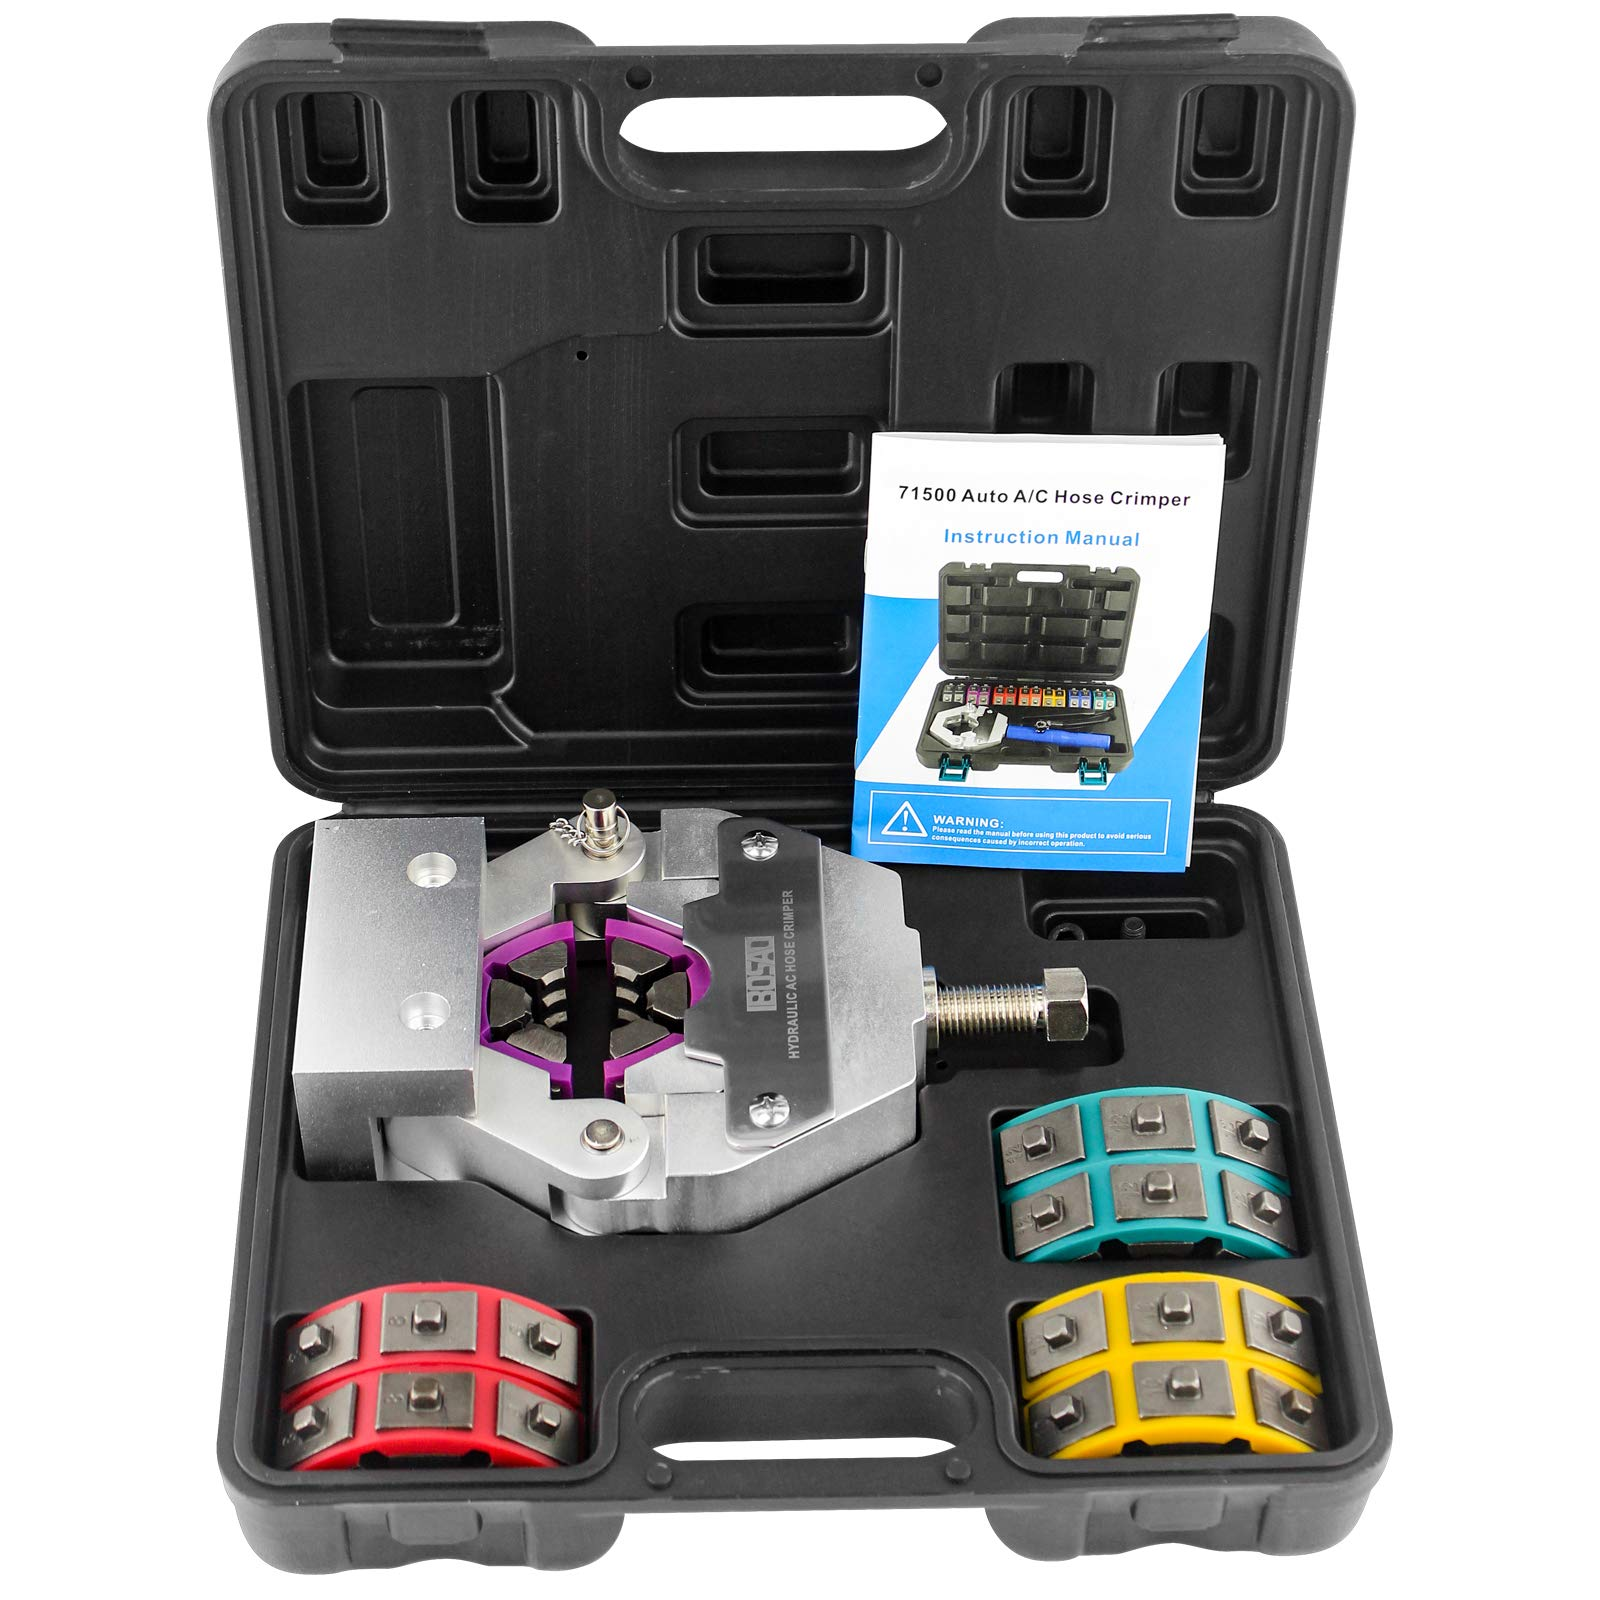 IBOSAD Manual A/C Hose Crimper Kit Automotive Air Conditioning Repaire Tools 71550 Hose Crimping Tool